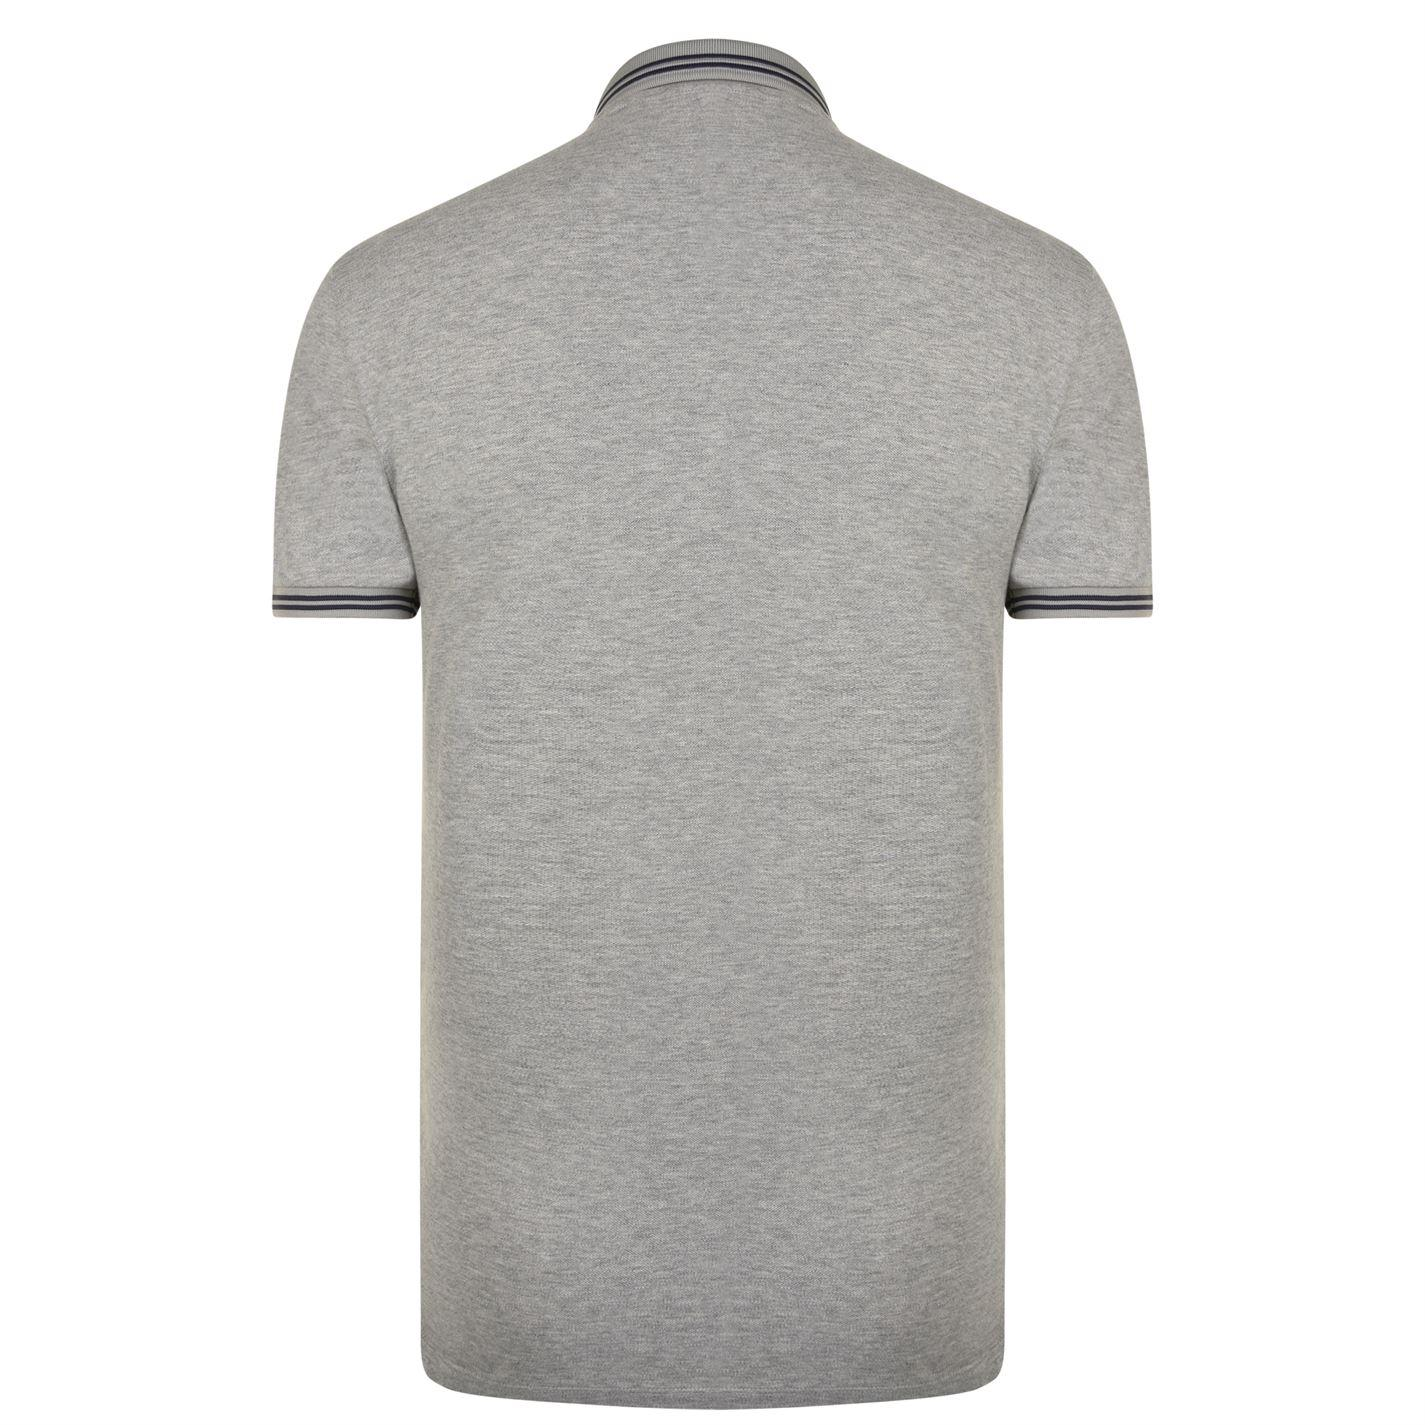 4ae2617e Lyst - Emporio Armani Tipped Polo Shirt in Gray for Men